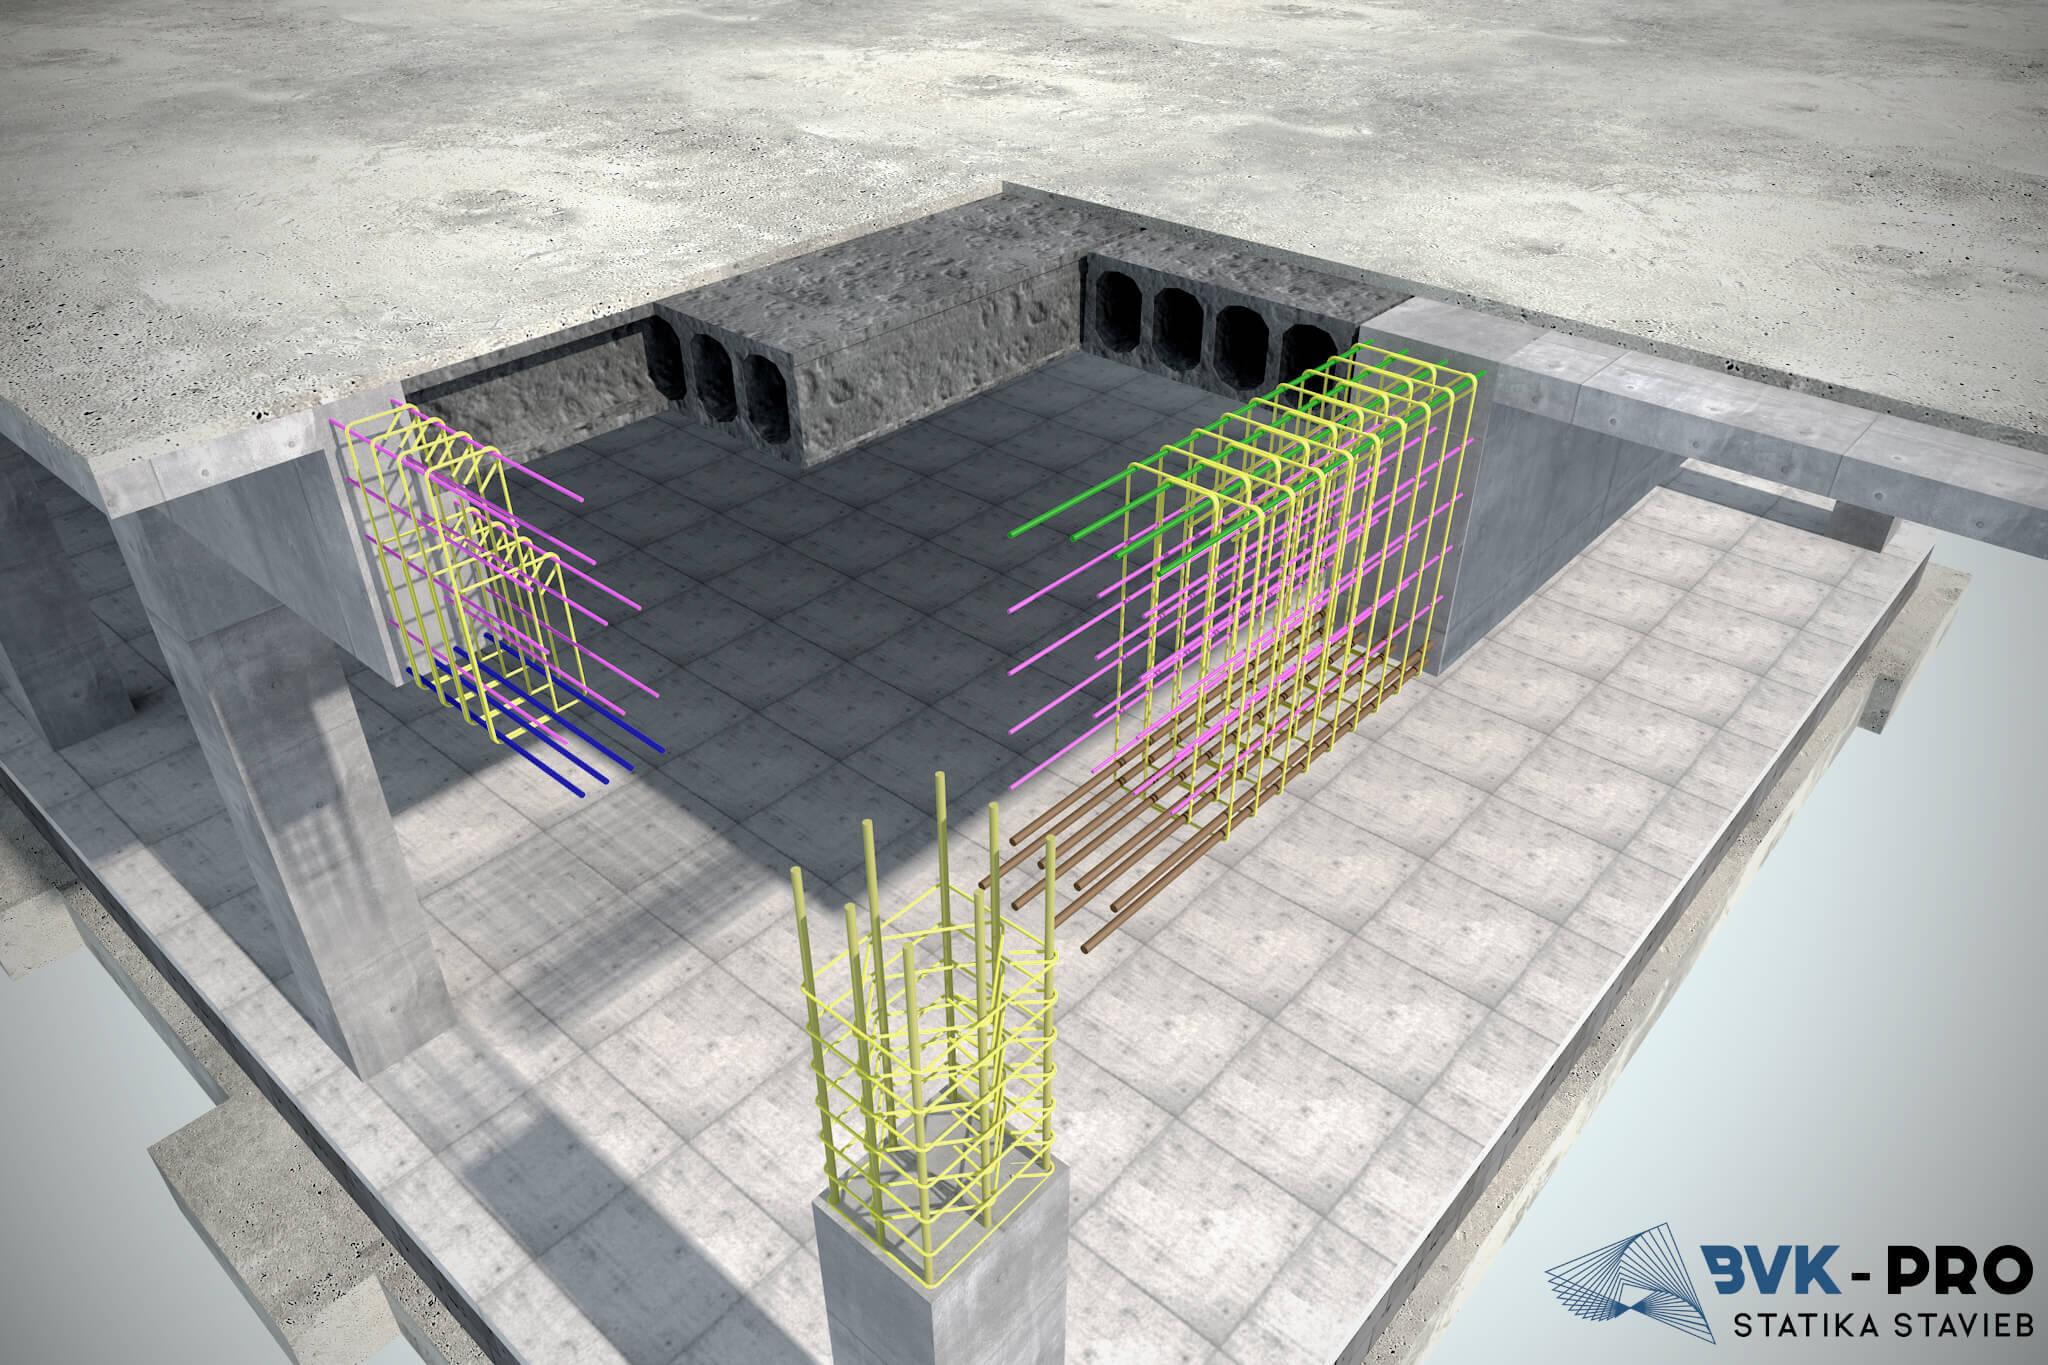 Administratývna Budova Bvk Pro  Statika Stavieb 02